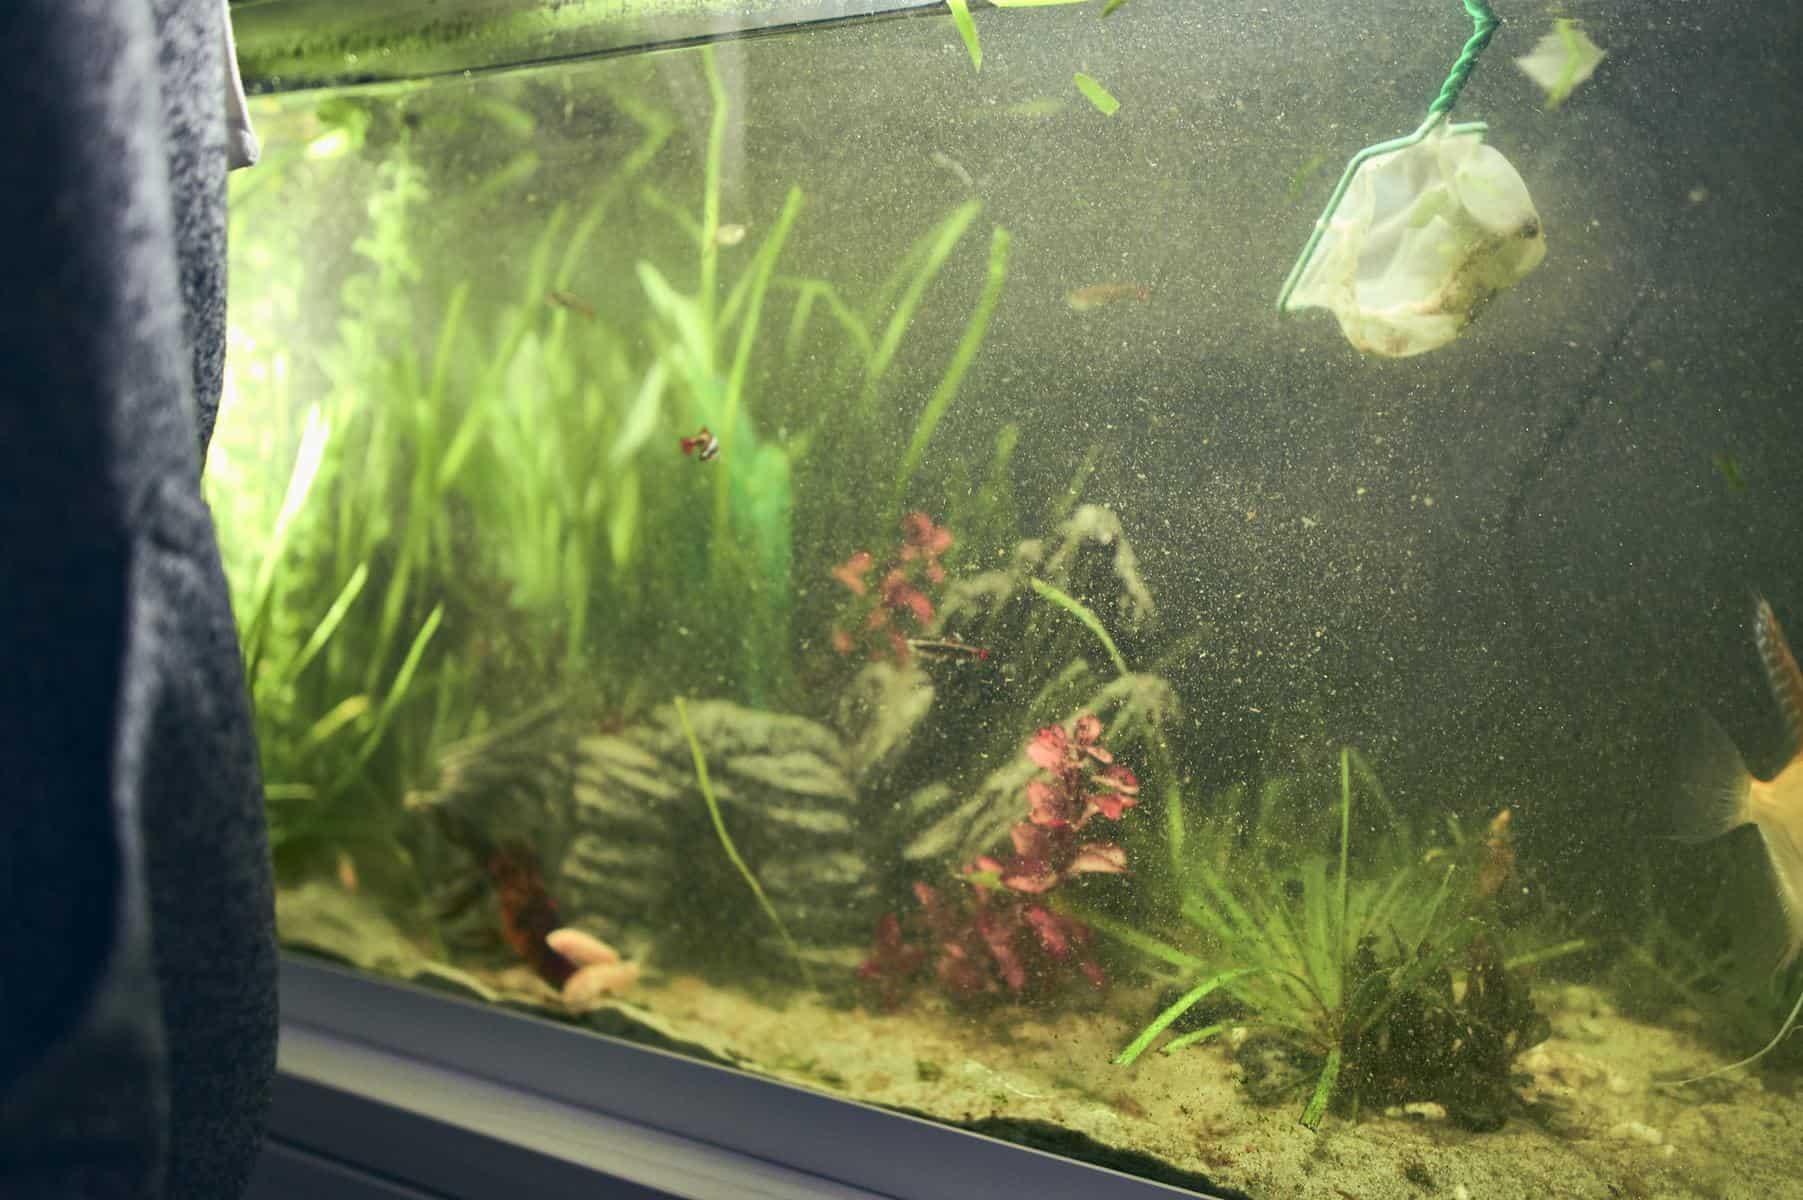 fishkeeper cleaning aquarium with green spot algae